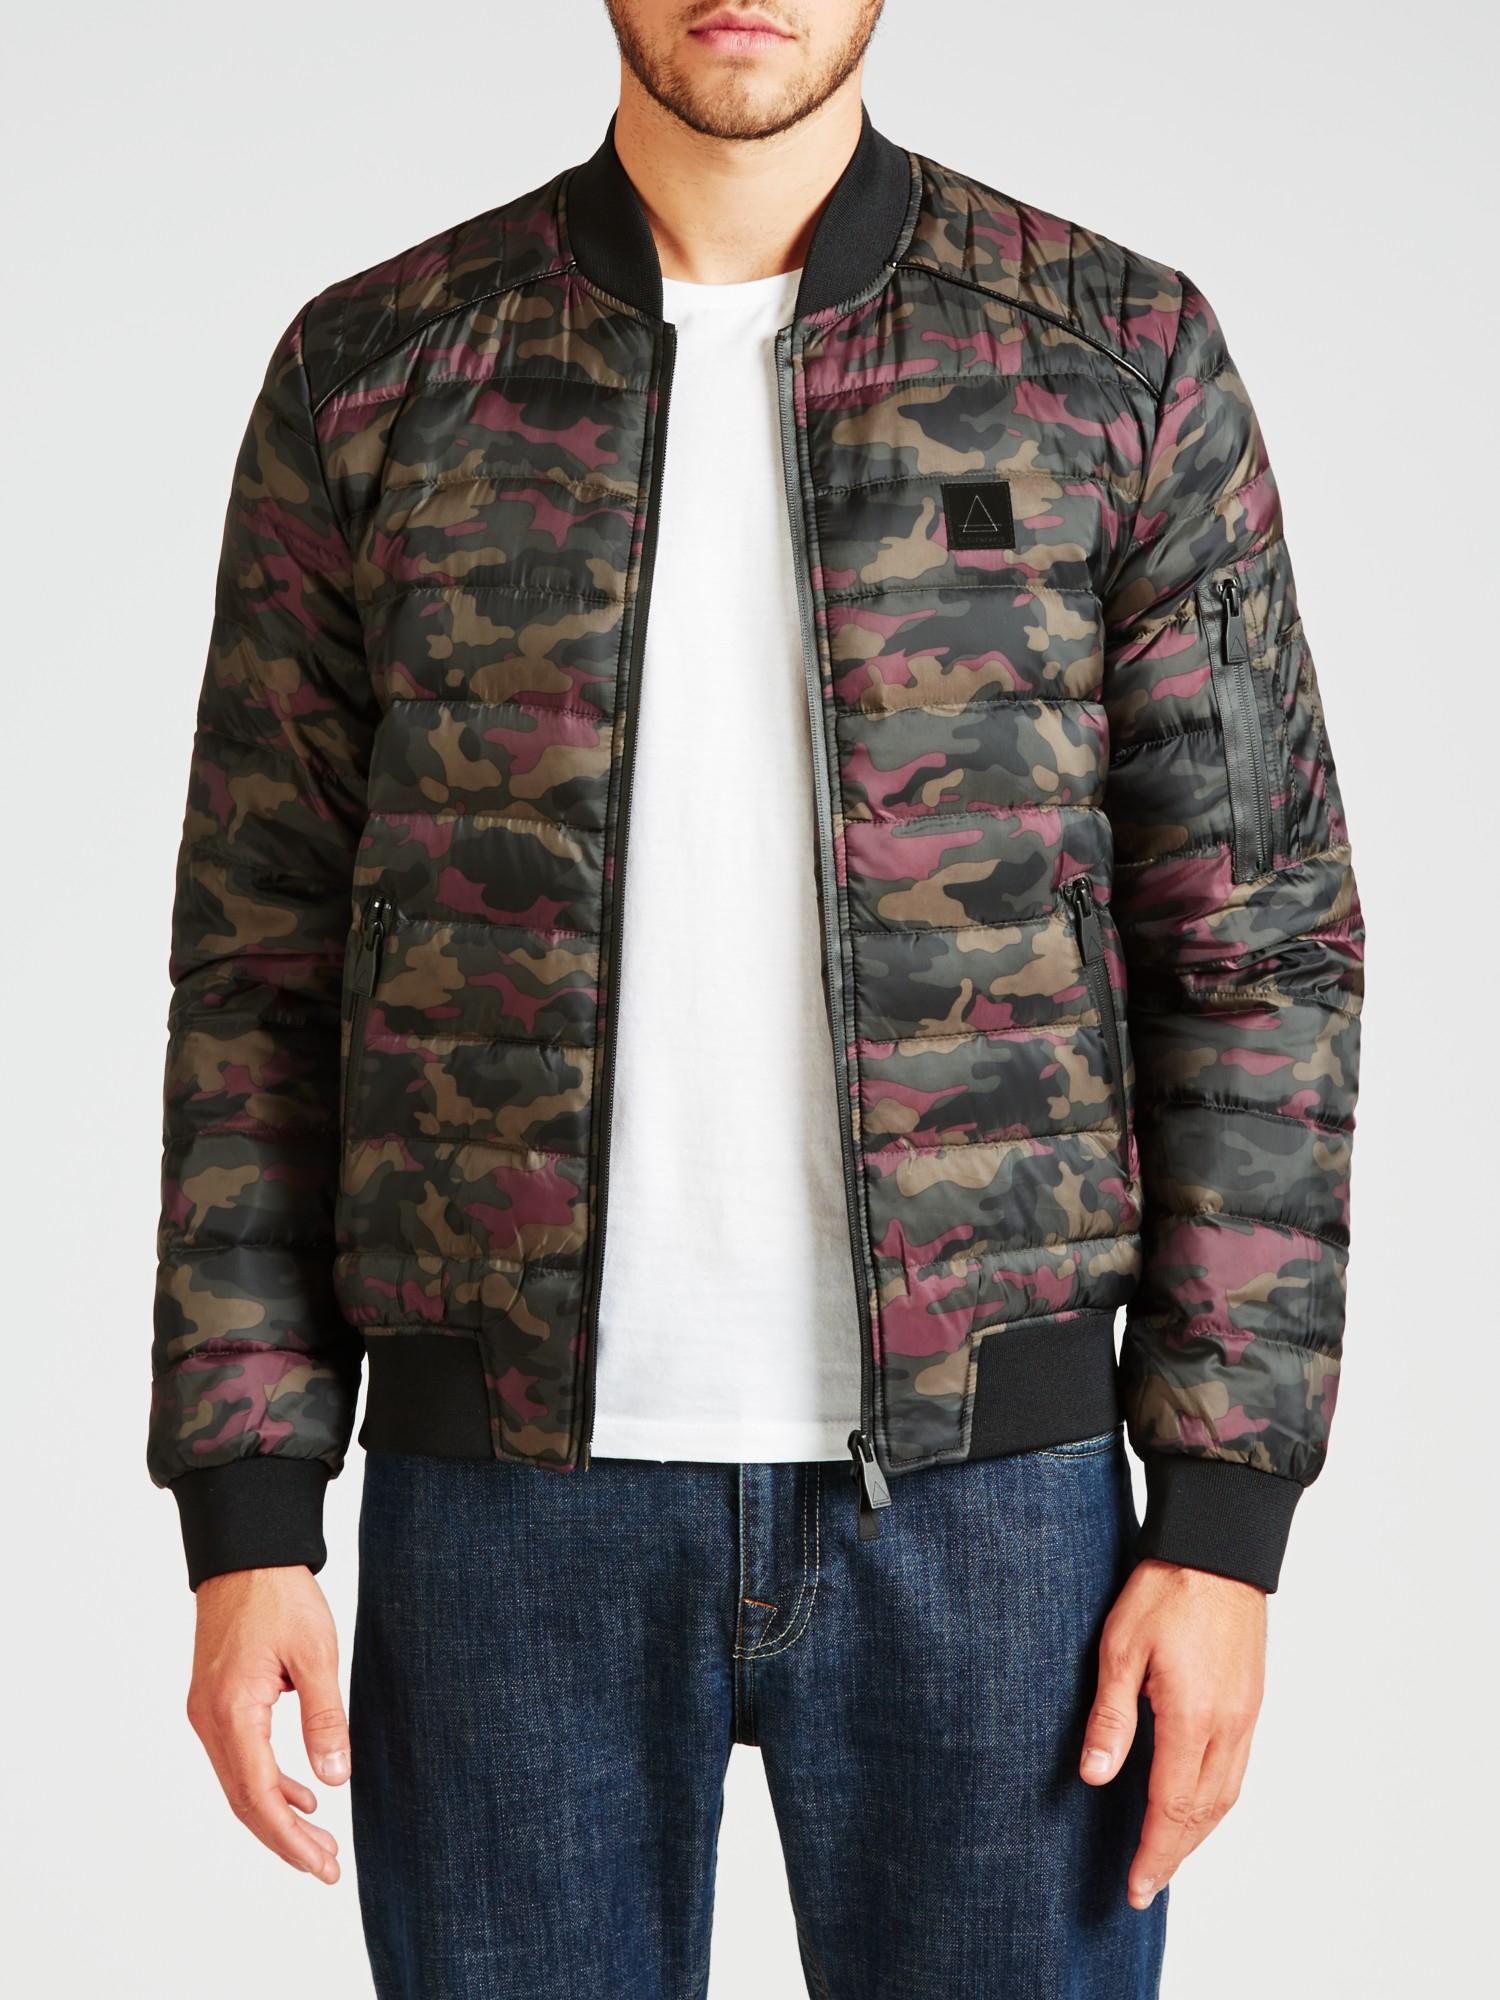 ELEVEN PARIS Denim Minor Camo Print Quilted Jacket for Men